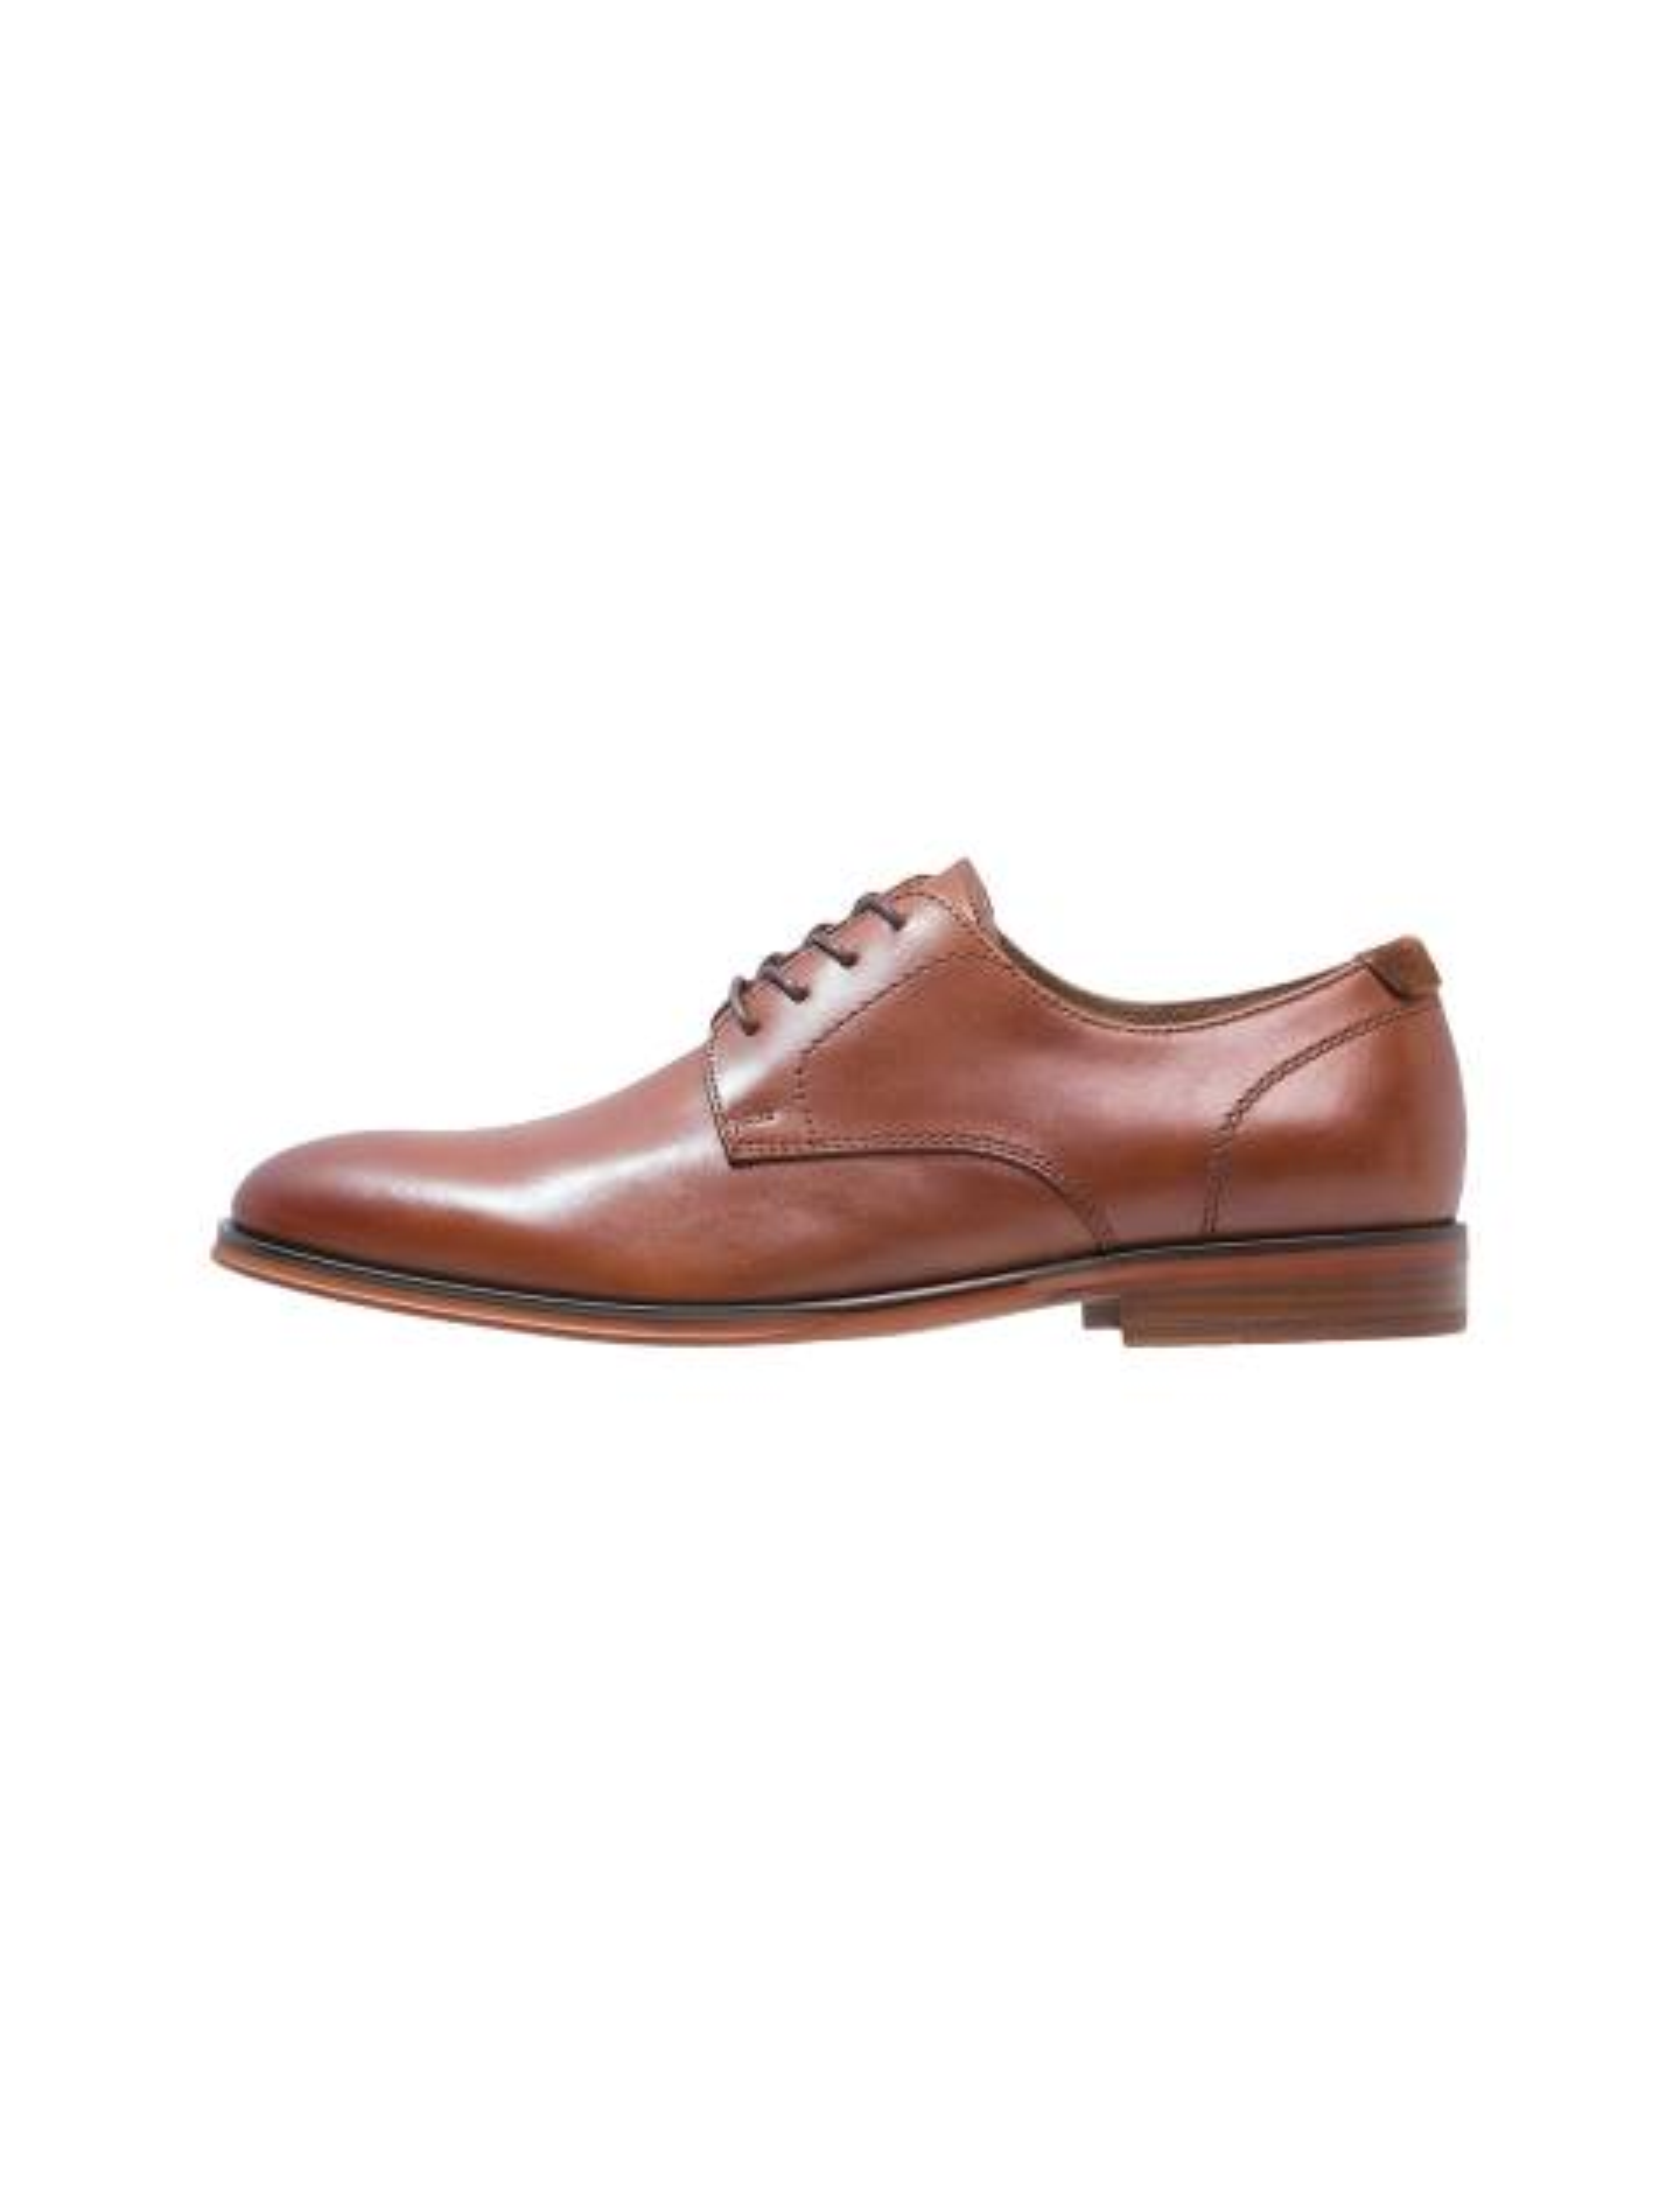 کفش چرم اداری مردانه - قهوه اي - 3